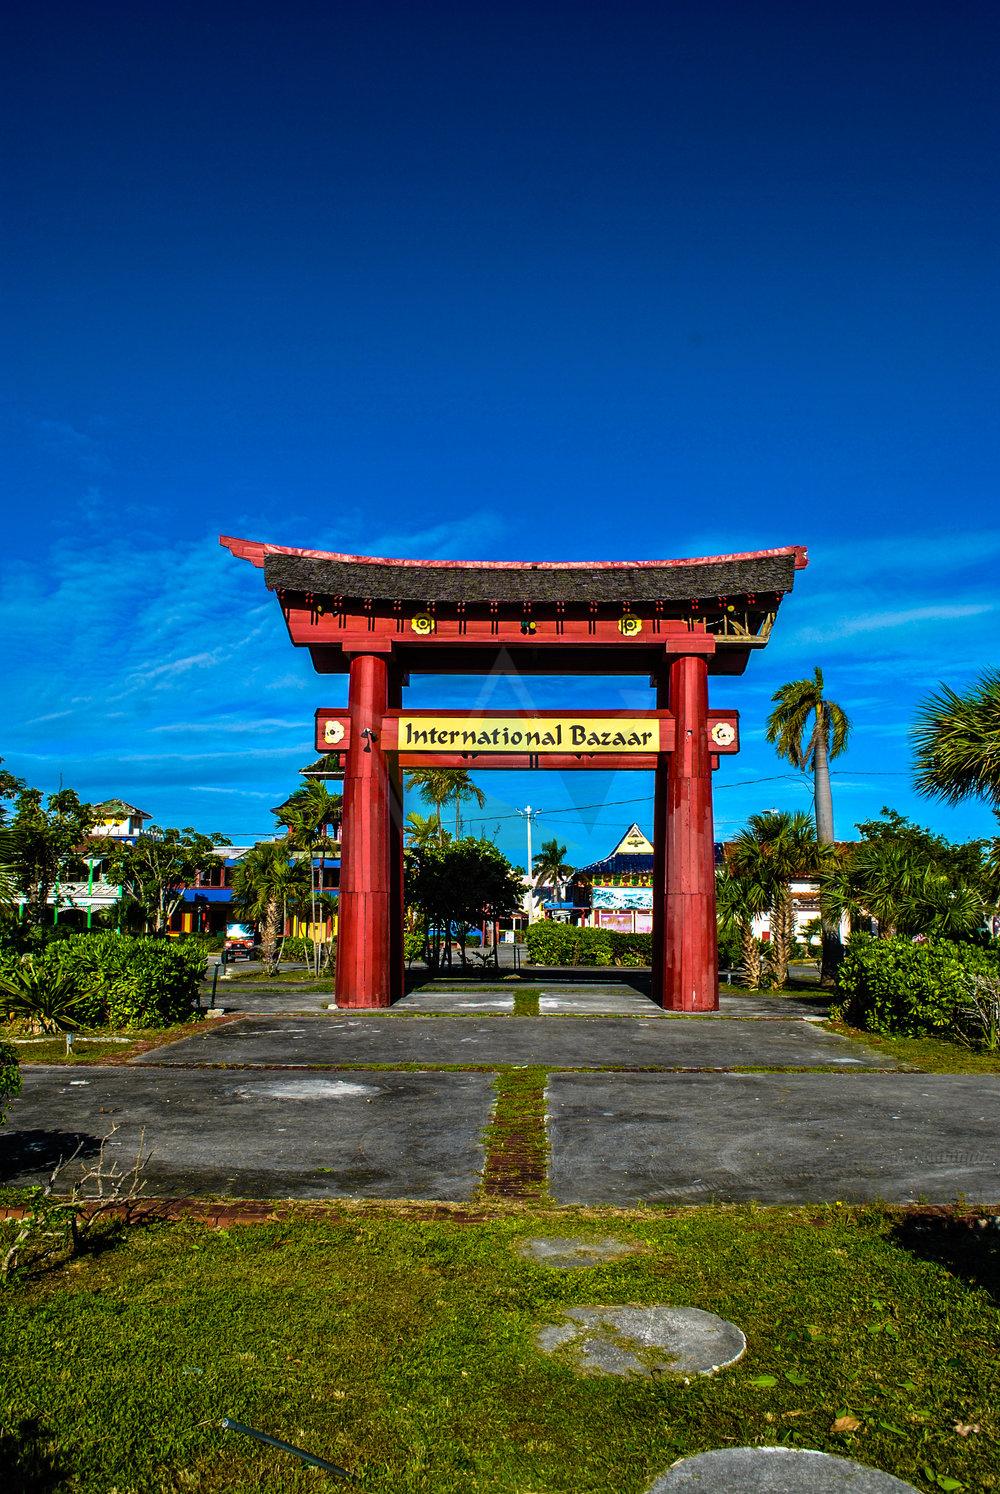 International Bazaar, Freeport, Grand Bahama